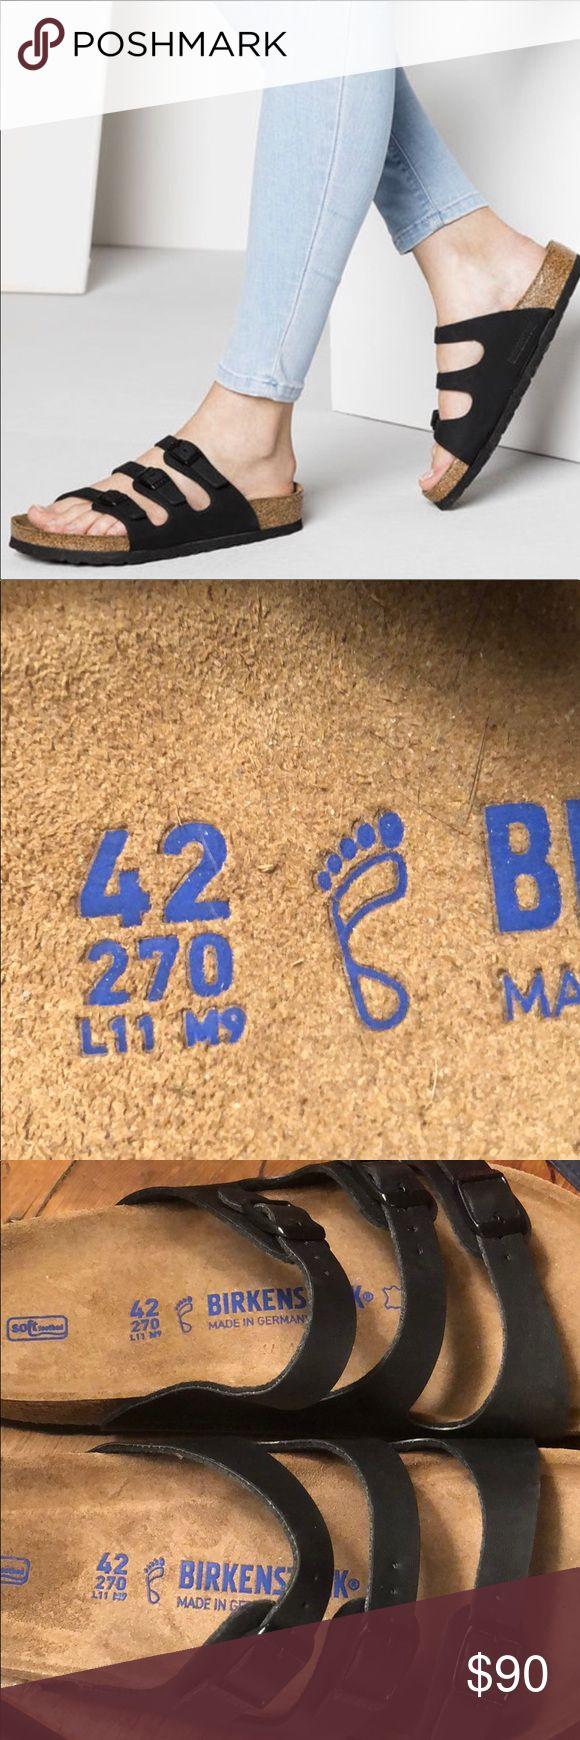 NEW Birkenstock Florida Black LADIES 11 / MEN 9 Birkenstock Florida Leather Soft Footbed Jet Black SZ 42 - LADIES 11 / MEN 9 NEW NEVER WORN BUT NO BOX  PRISTINE CONDITION Shoes Sandals